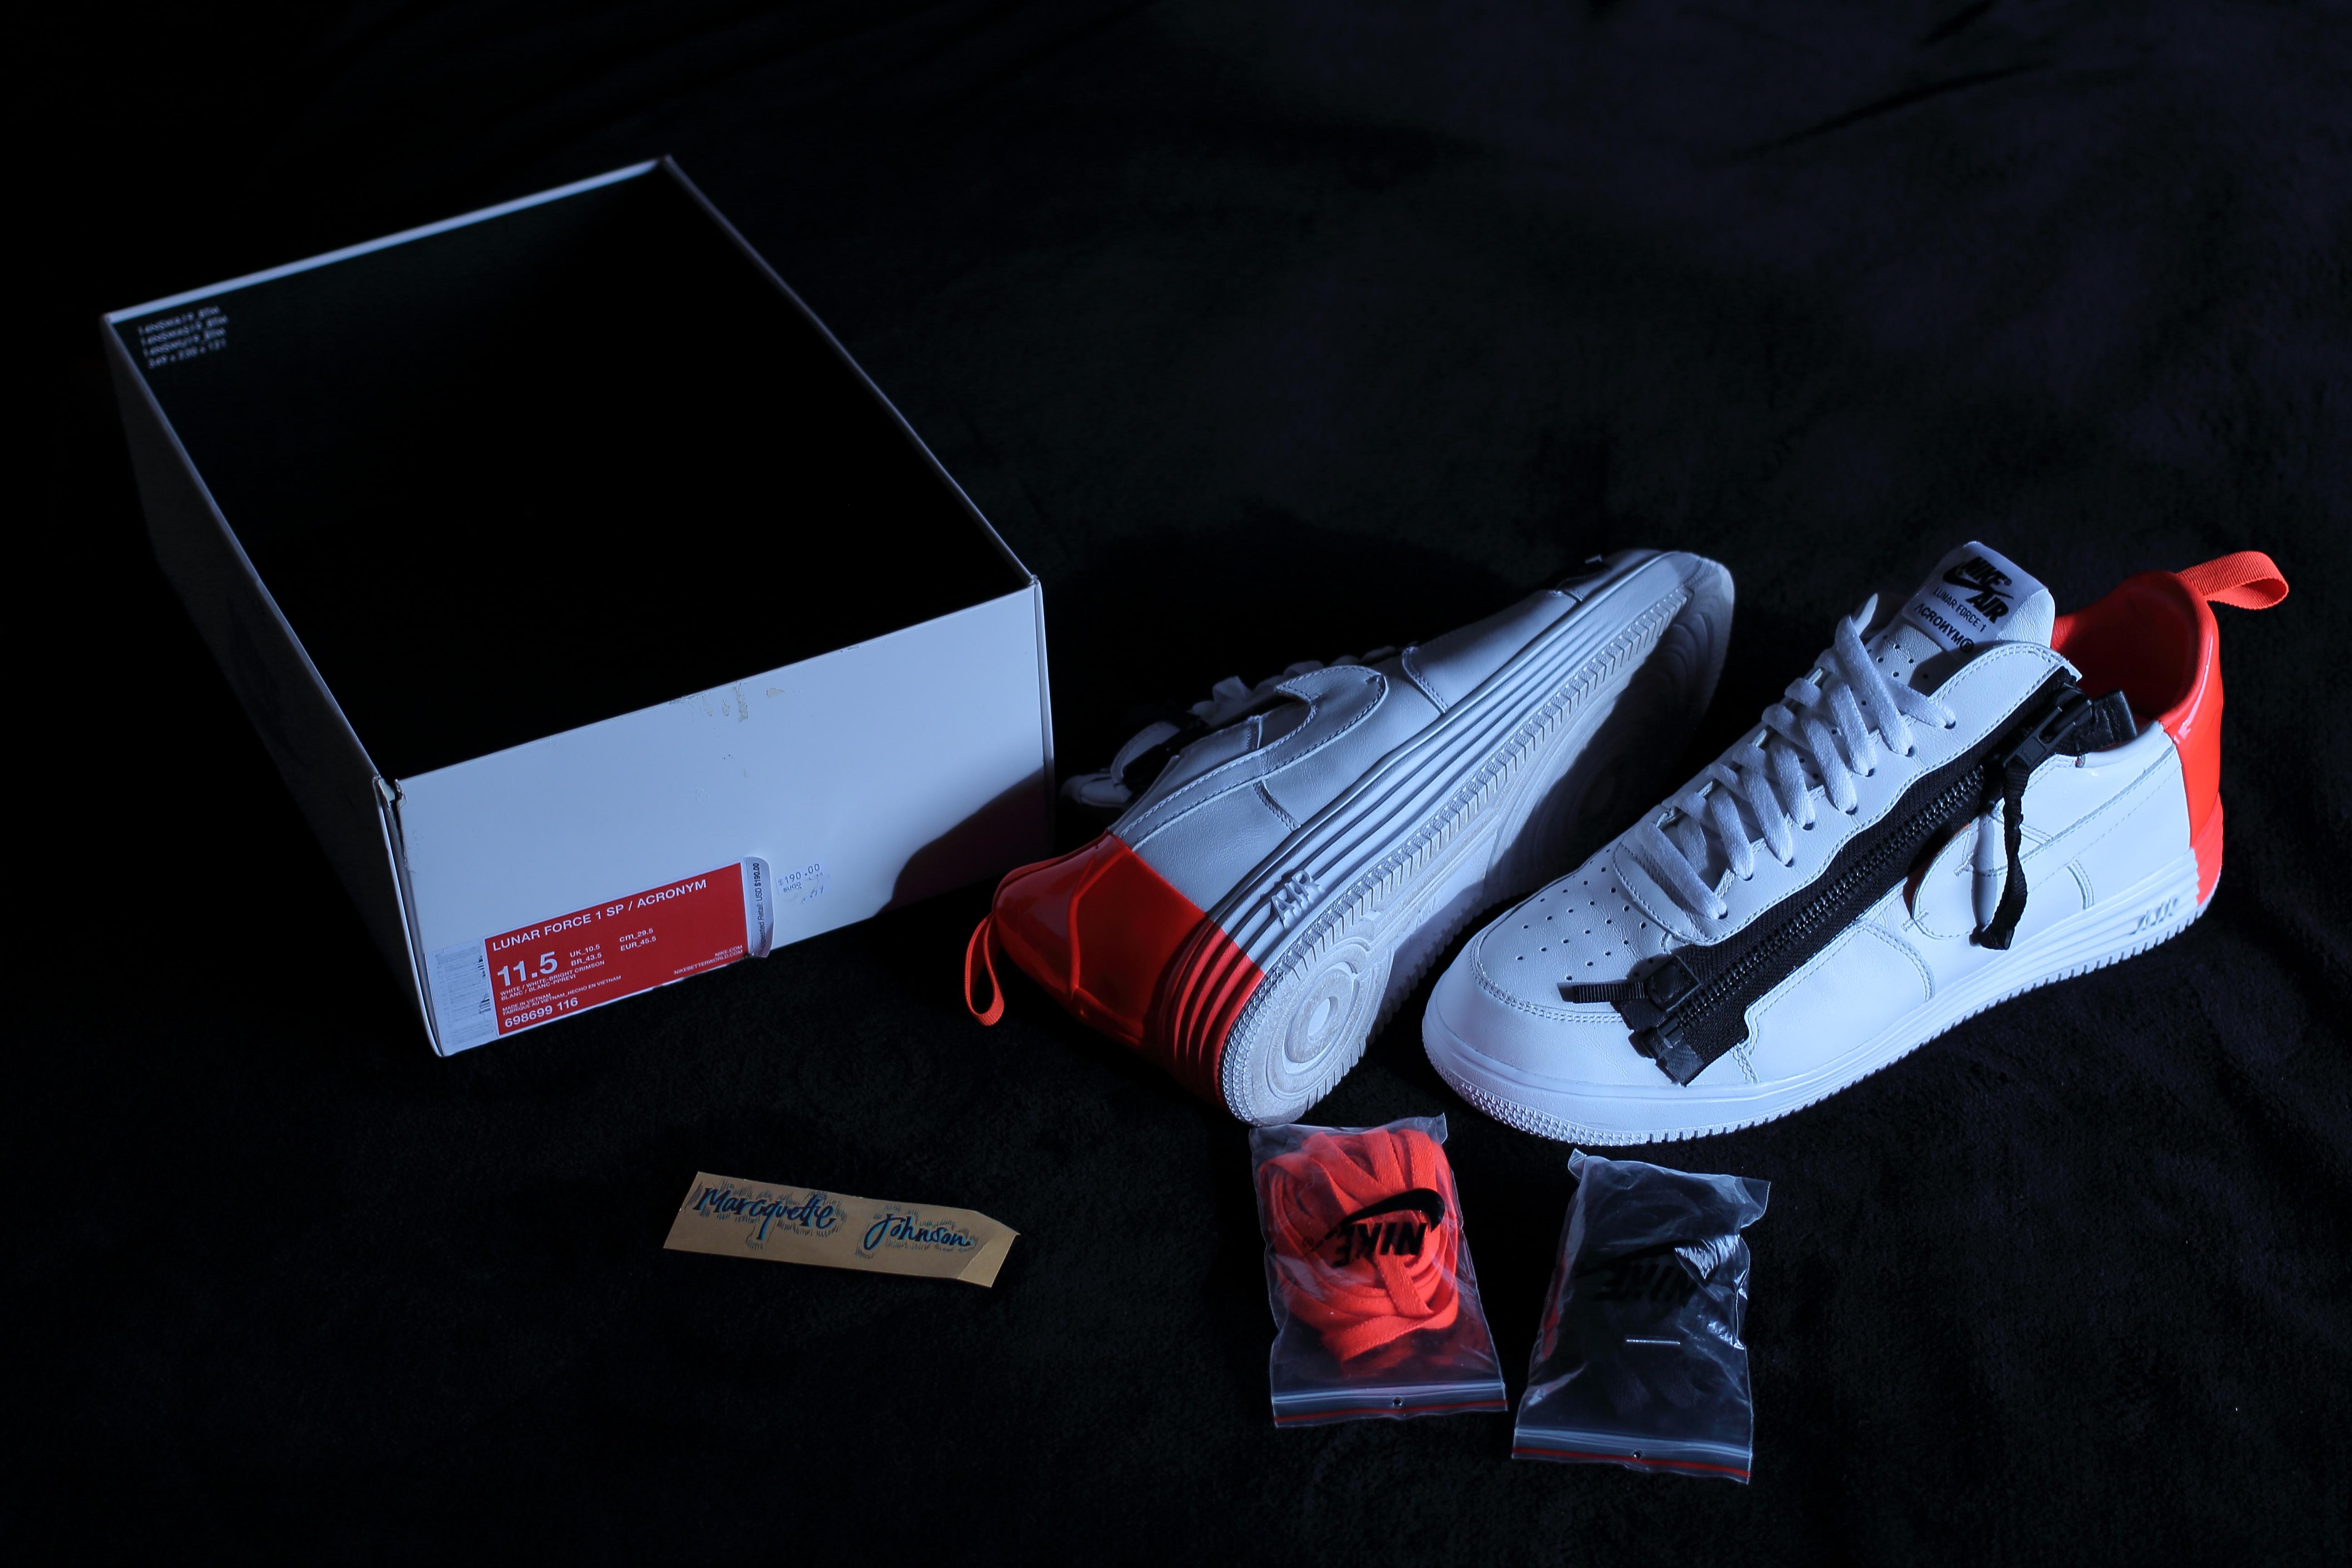 buy online dc9d4 7d979 Nike × Acronym. Nike Lunar Force 1 SP x Acronym White  Bright Crimson ...